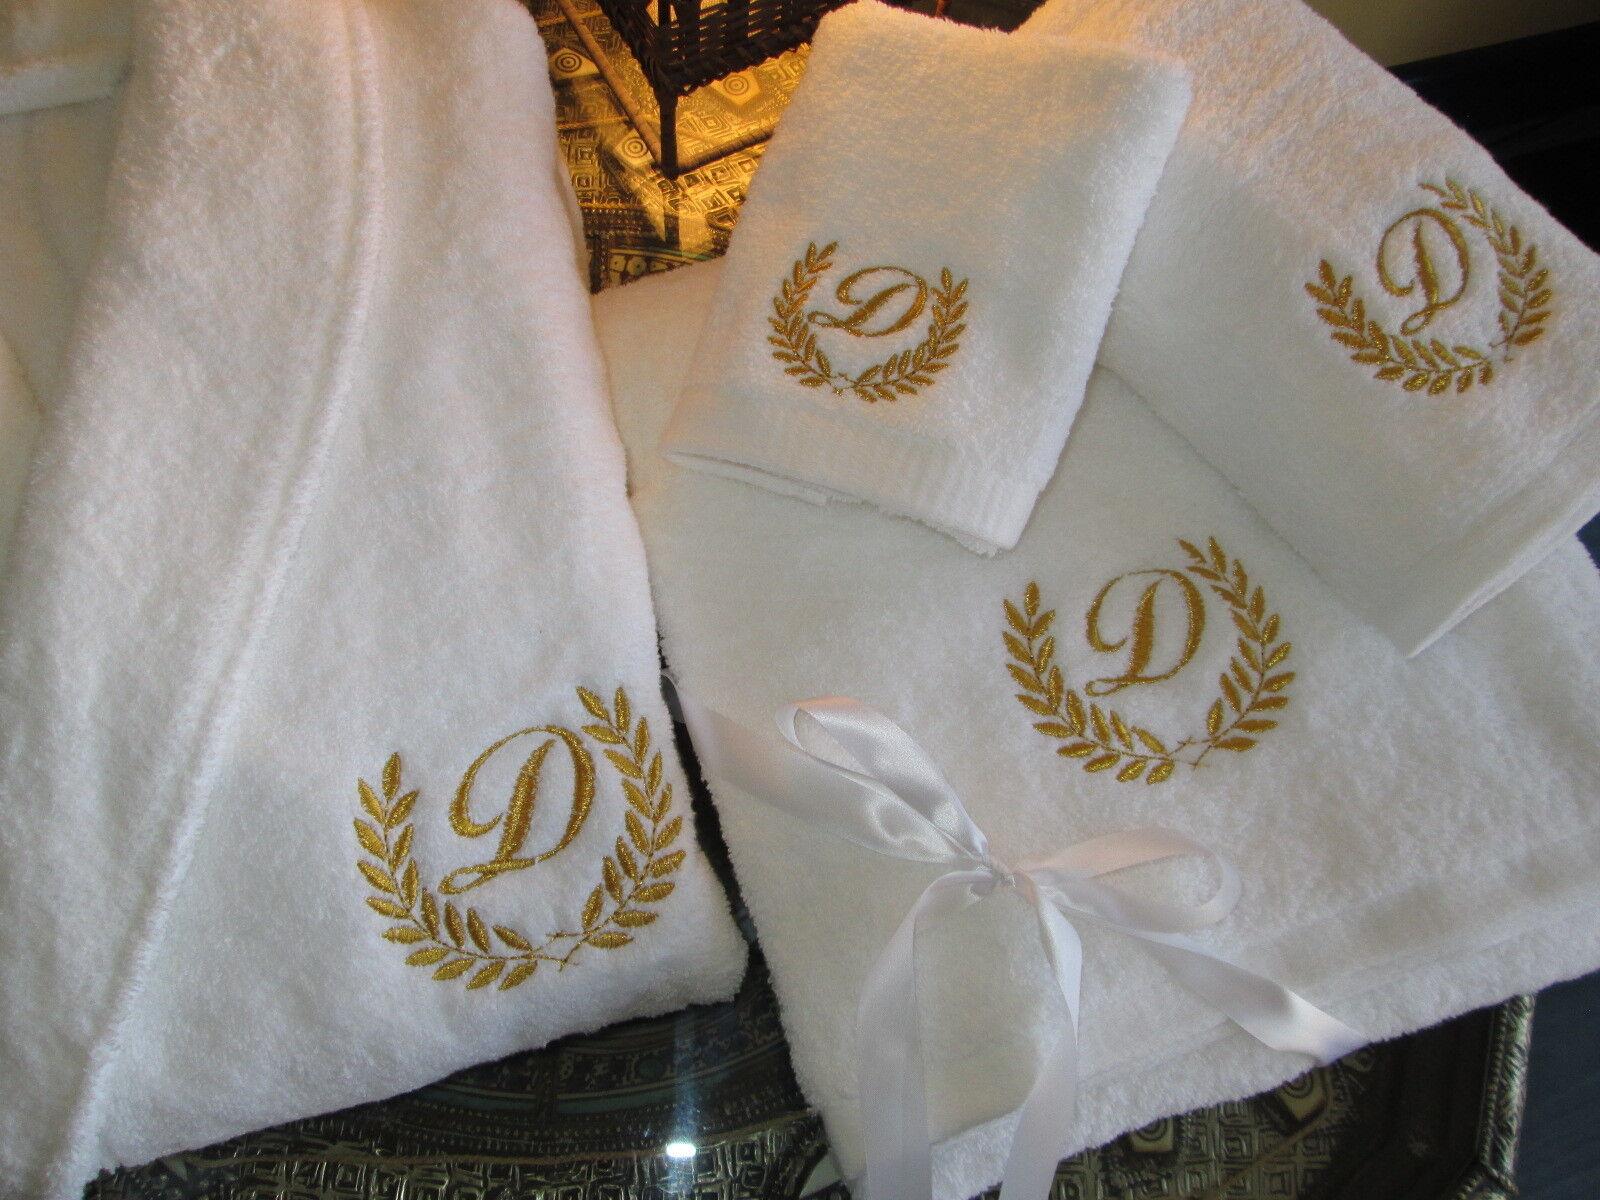 974e86fb89b3 Details about 5  Hotel Edition White Set Bathrobe